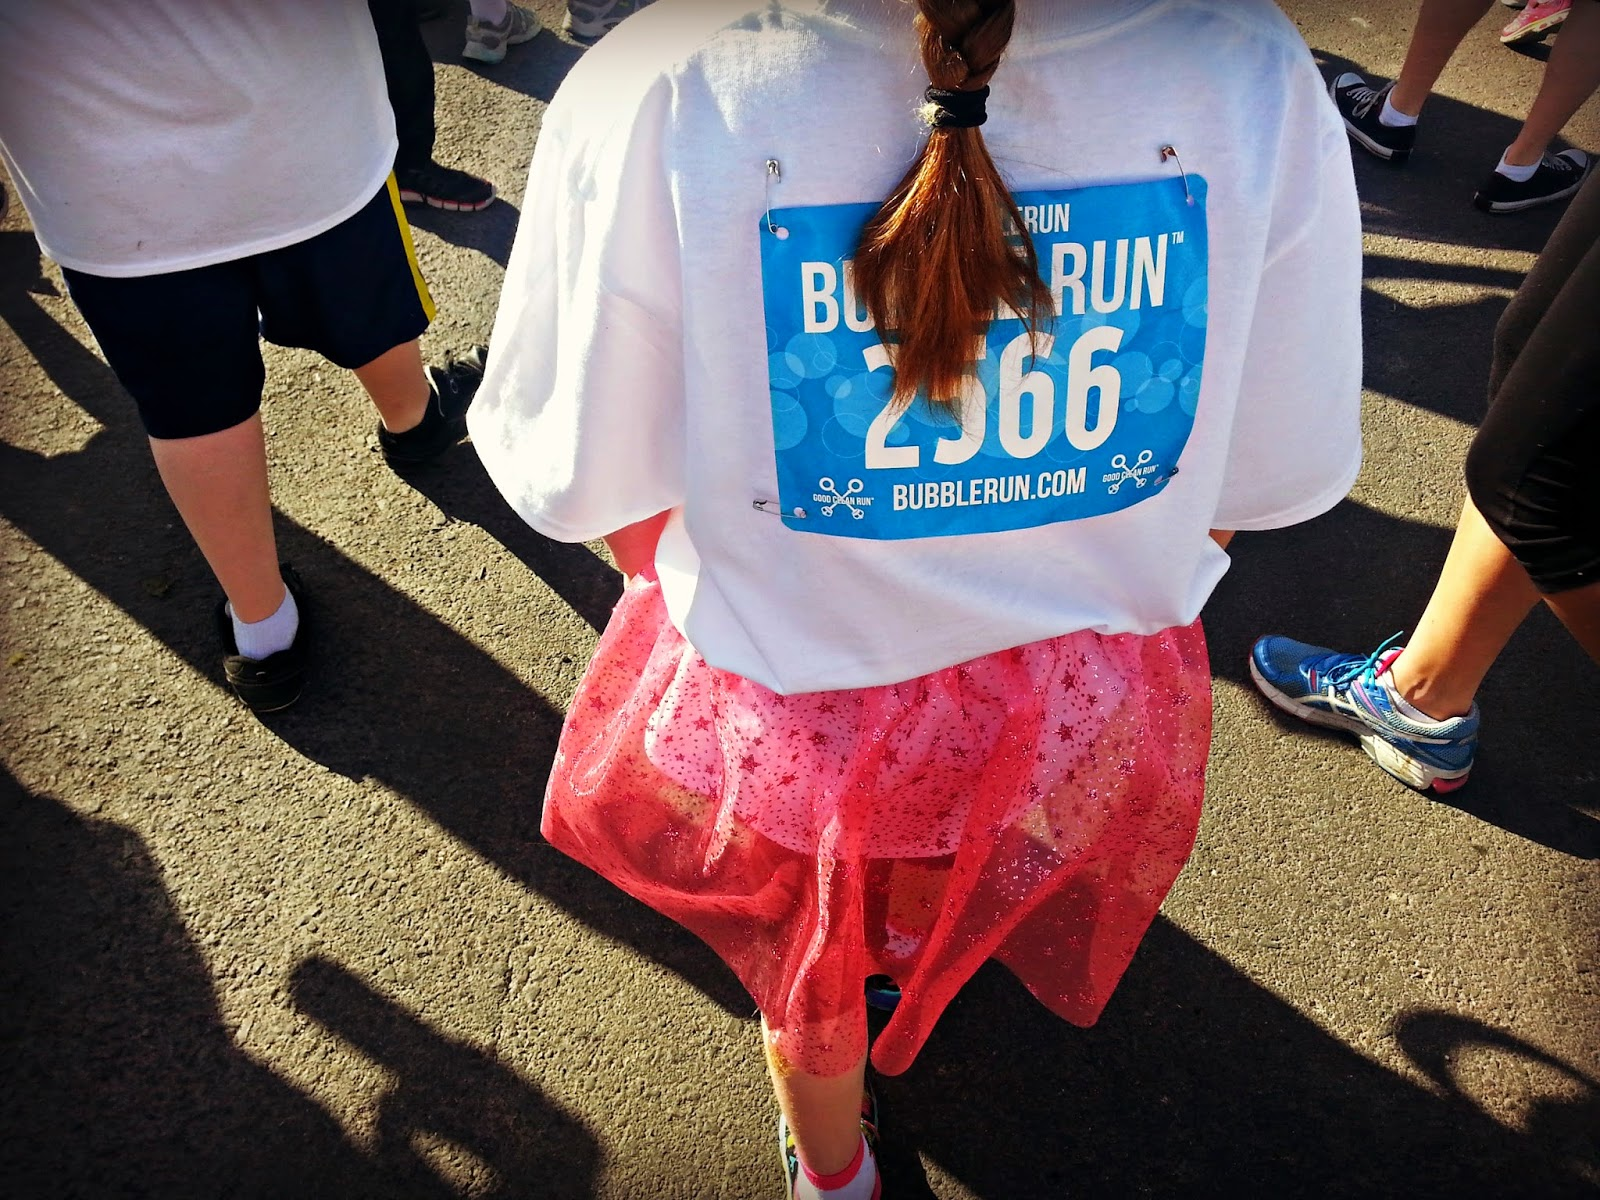 Bubble Run 2015...